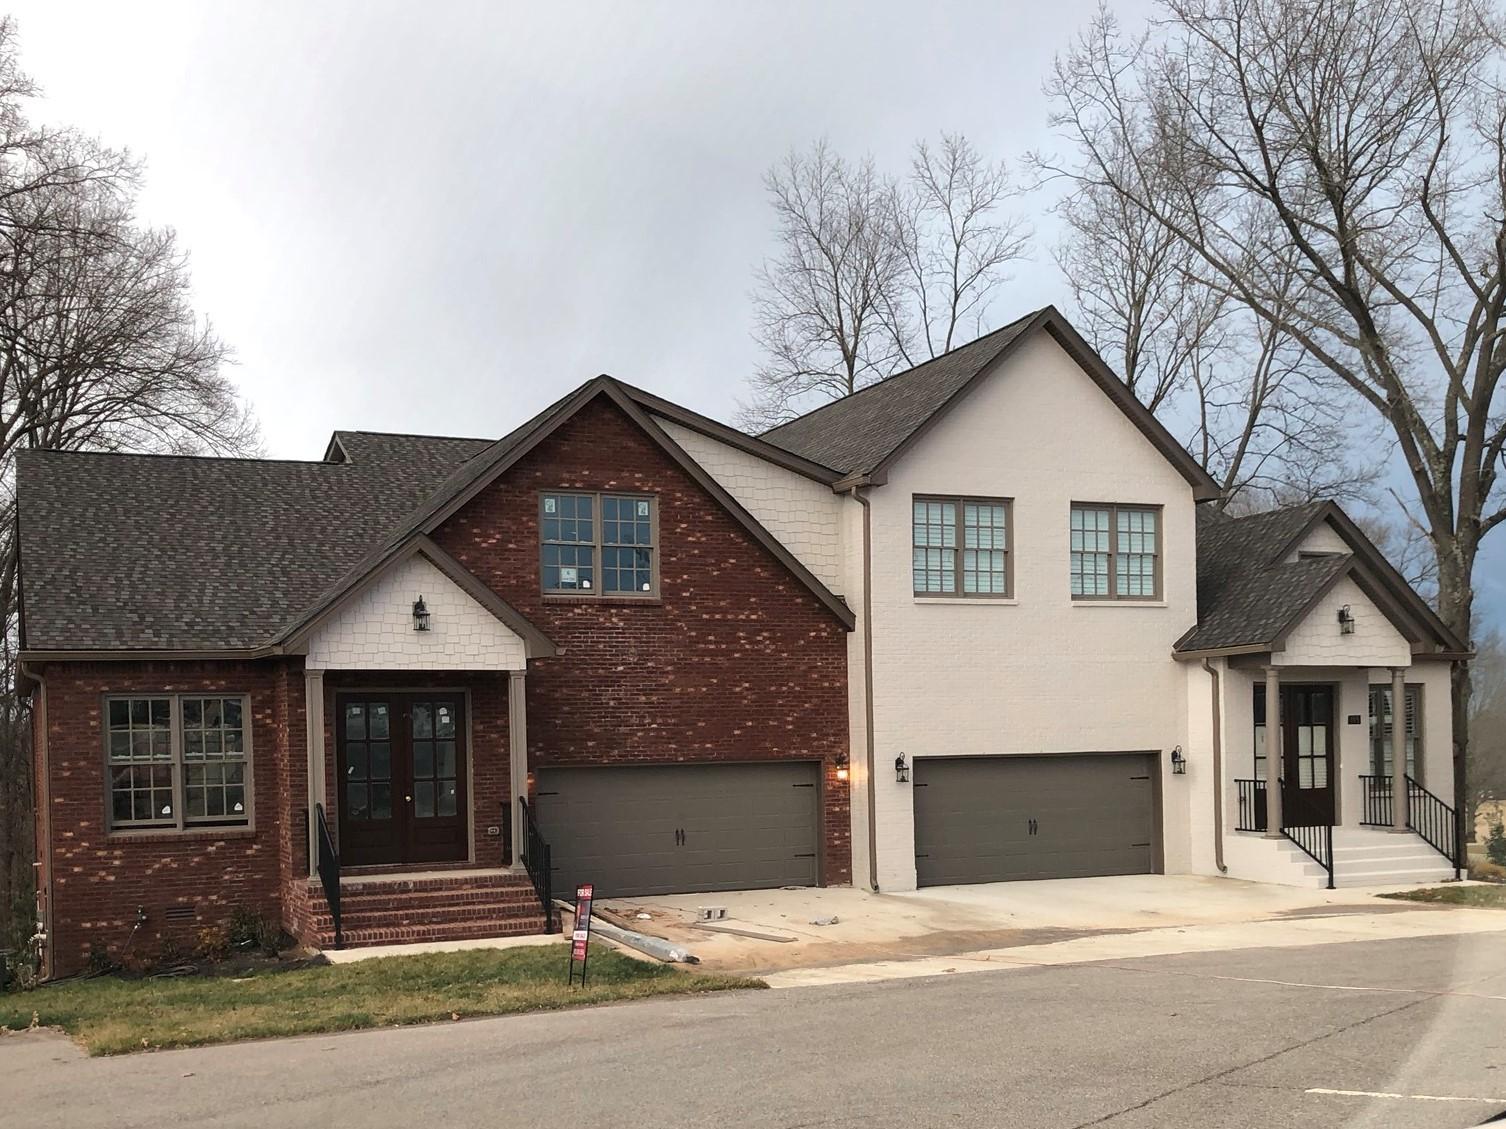 334 Fairway Drive, Clarksville, TN 37043 - Clarksville, TN real estate listing